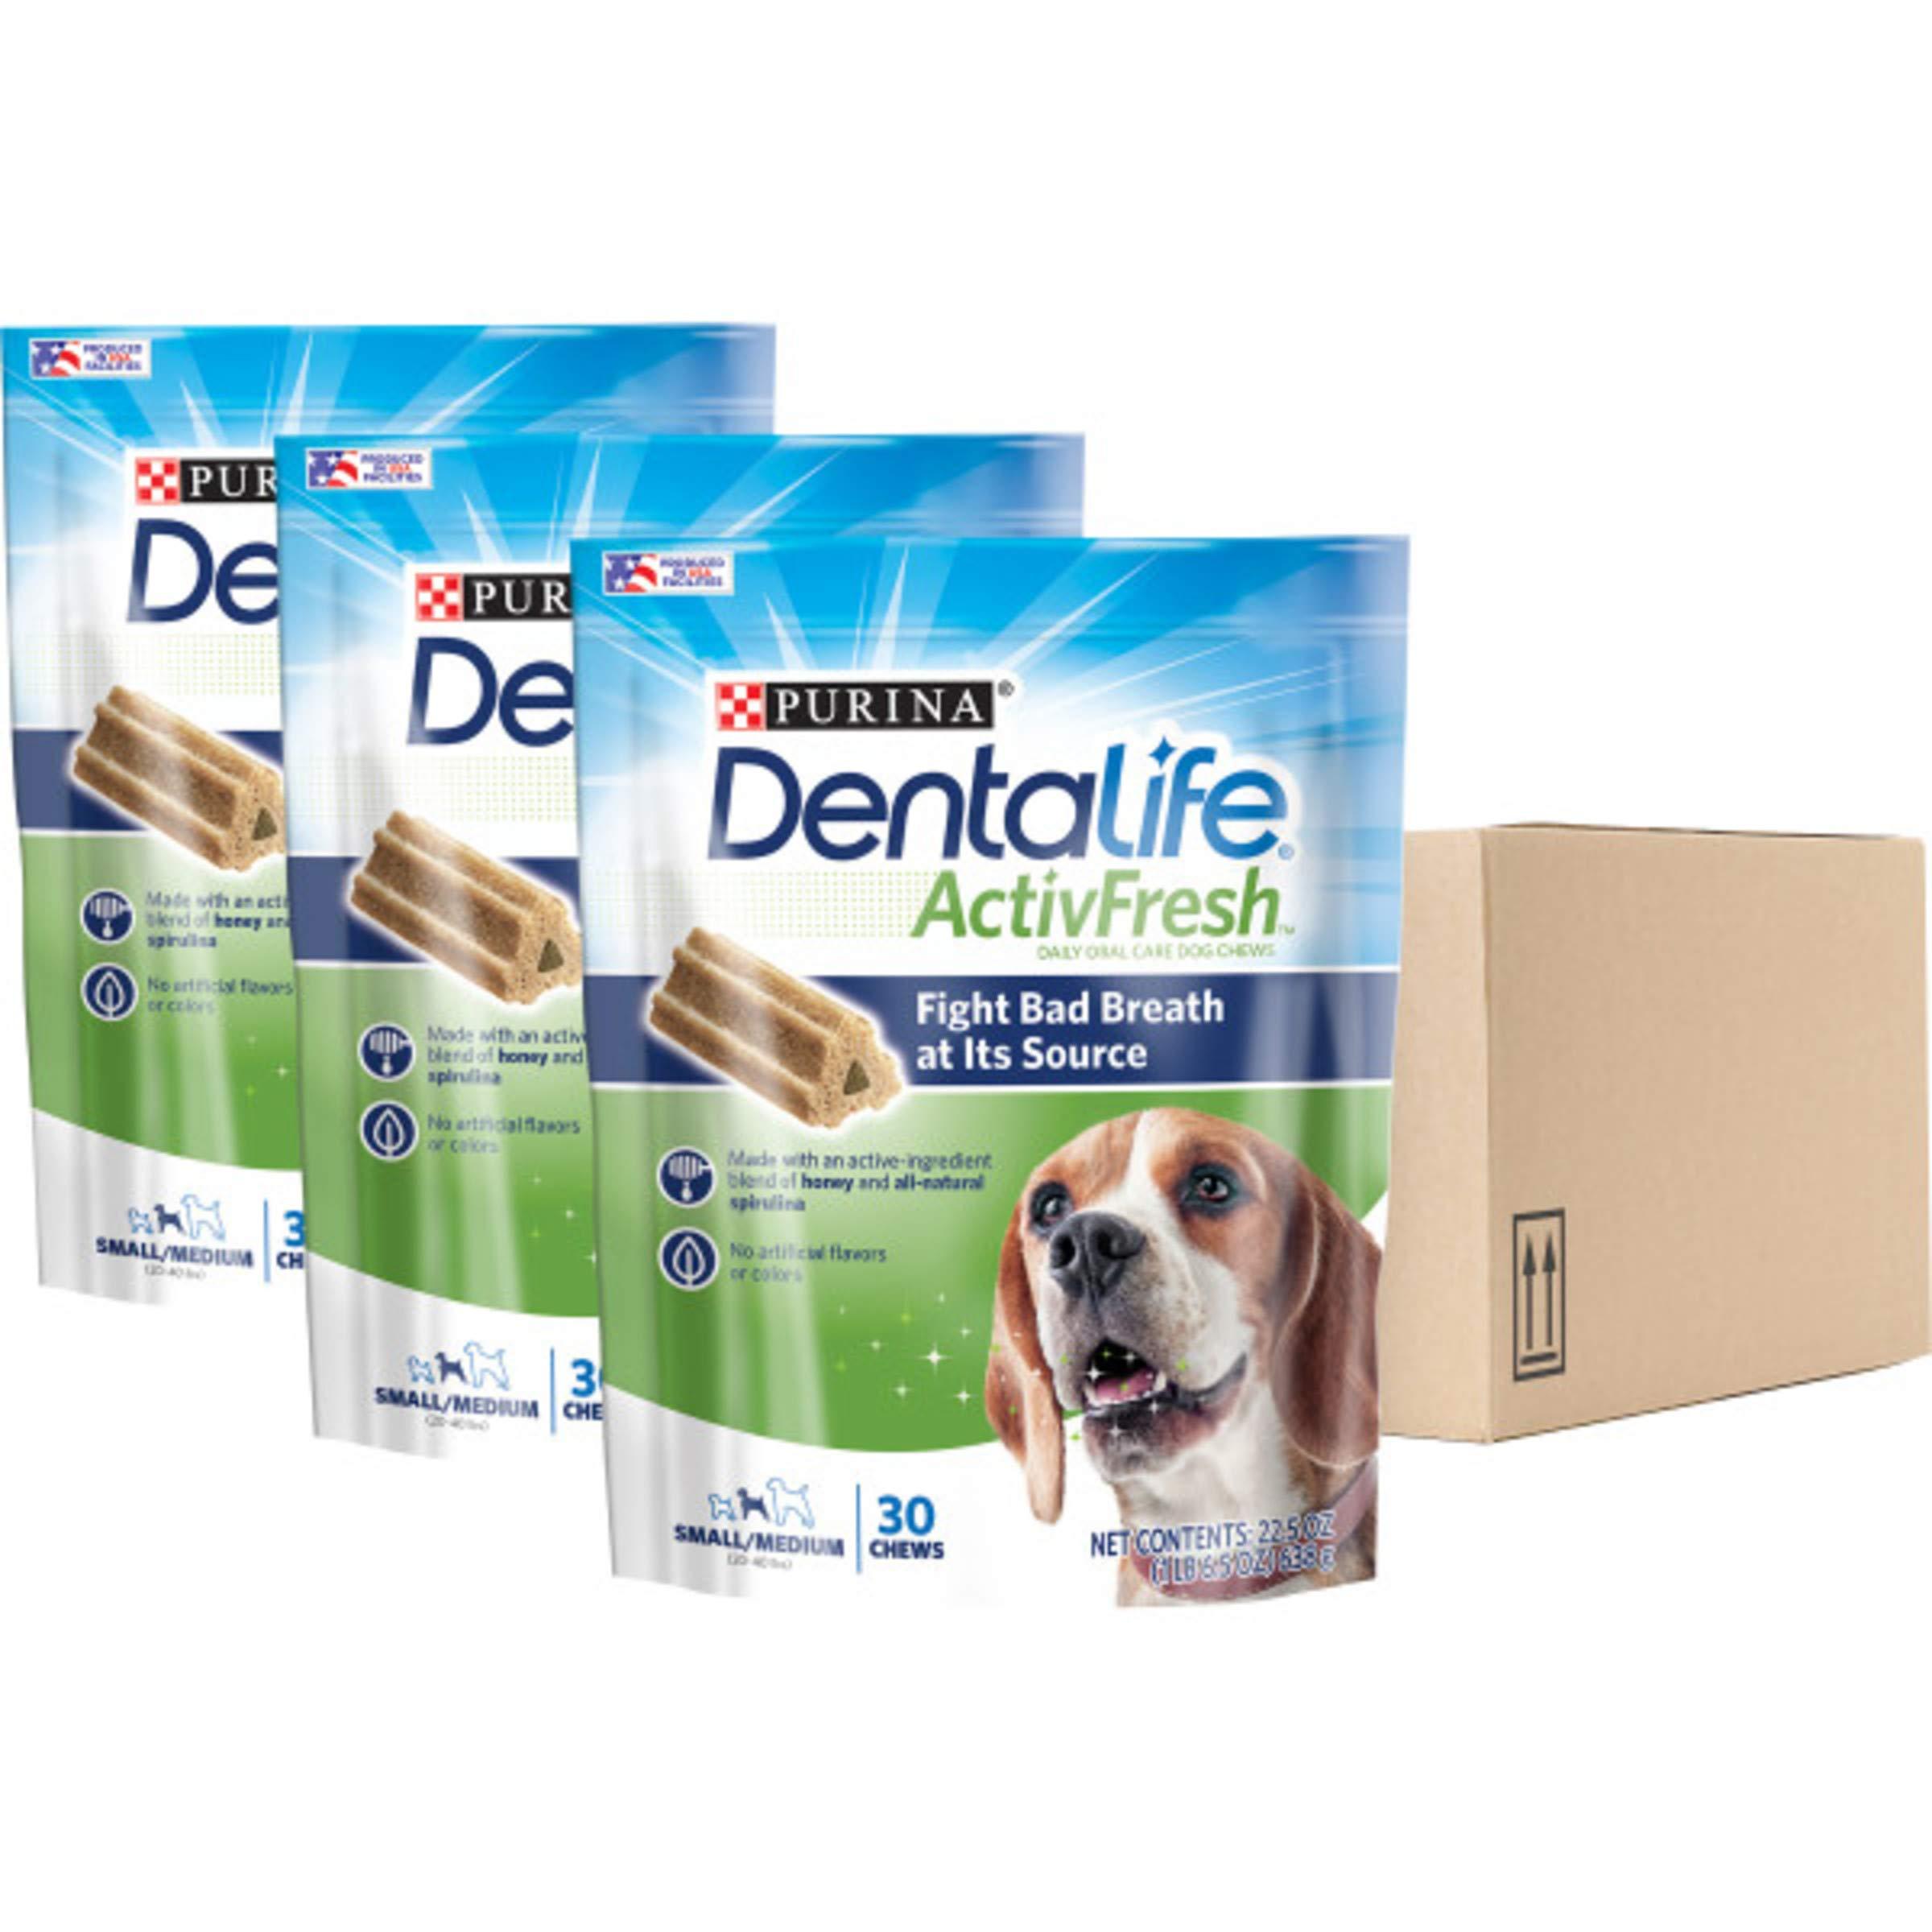 Purina DentaLife Small/Medium Adult Dental Dog Chew Treats